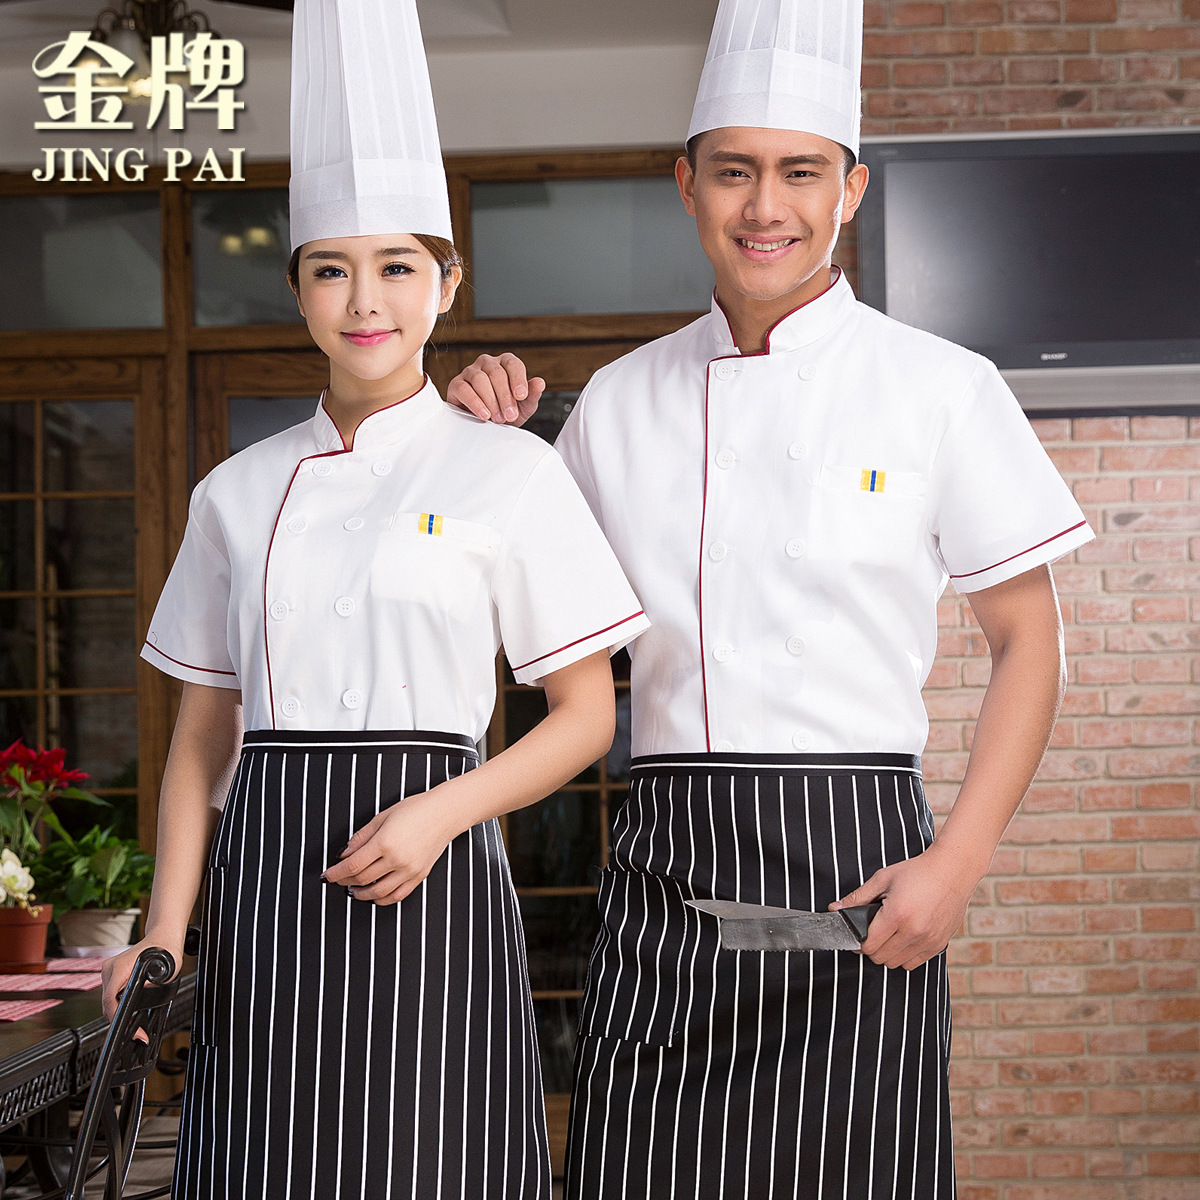 New Hotel Restaurant Chef Jacket Male Short Sleeved Kitchen Wear Adult Cake Bakers Chefuniform Kitchen Work Clothes B-6036